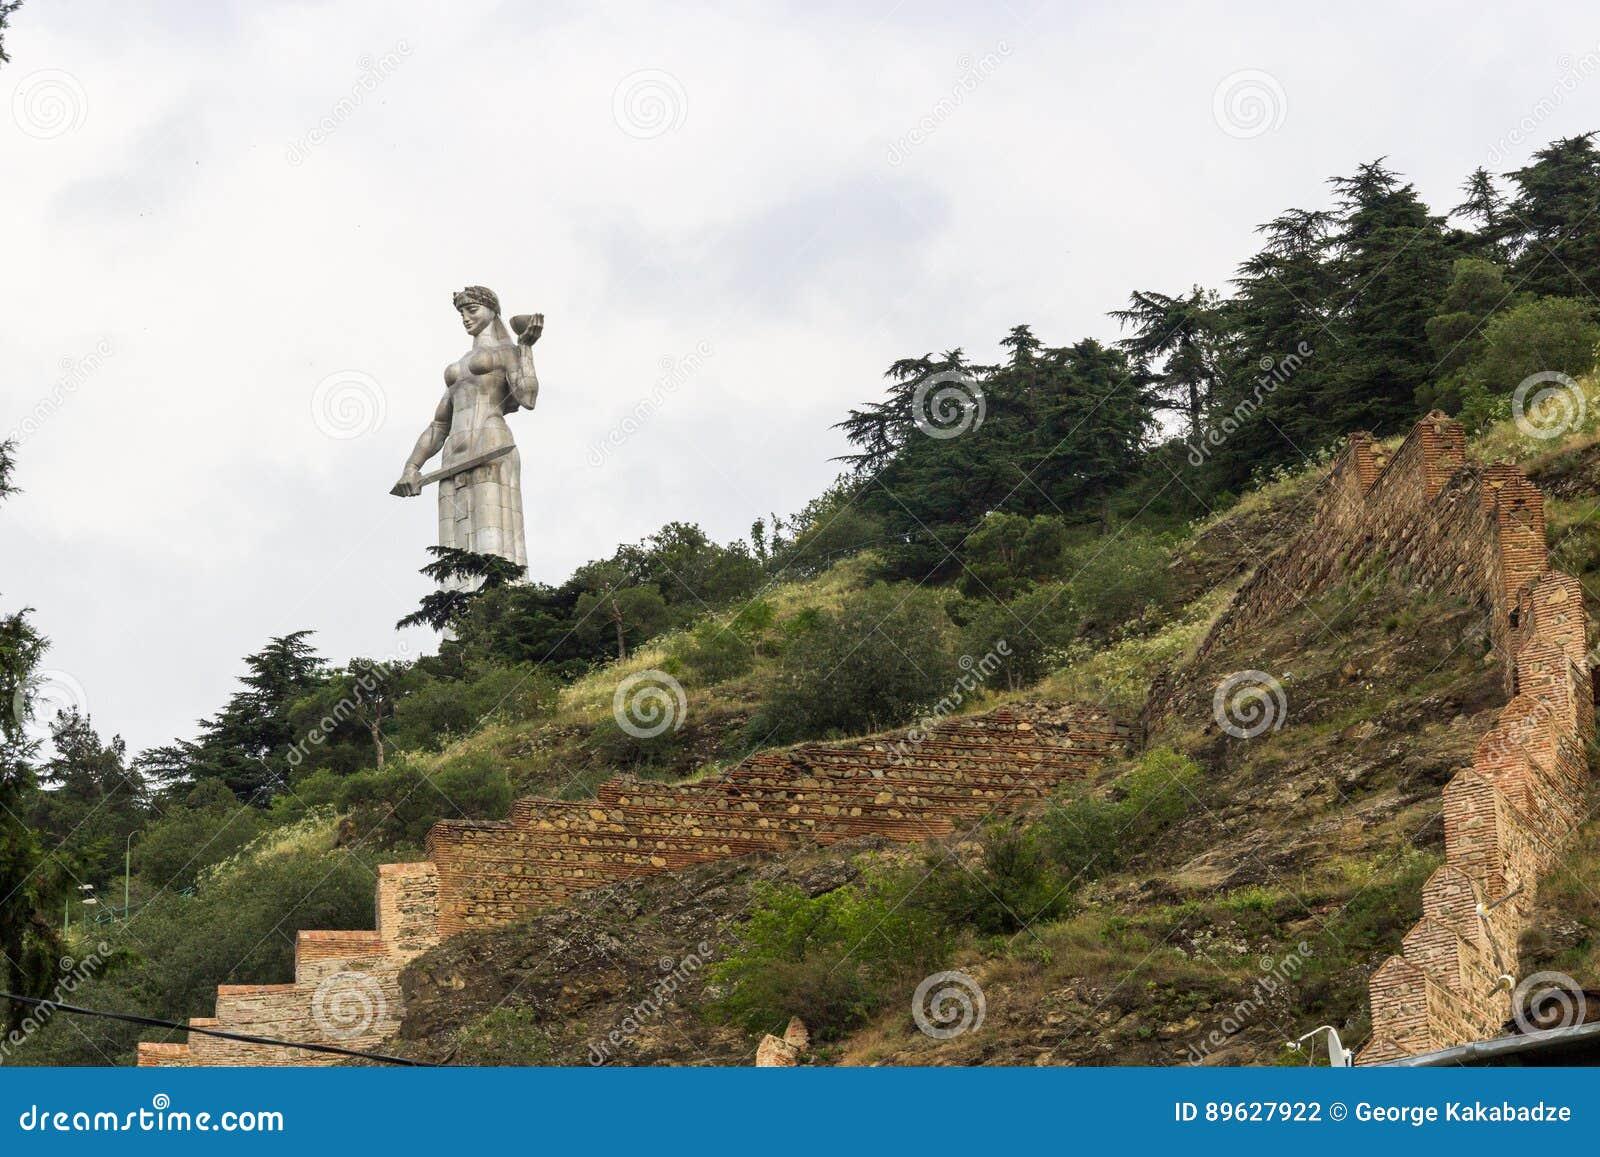 Mutterlands-Mutterstatue Tiflis